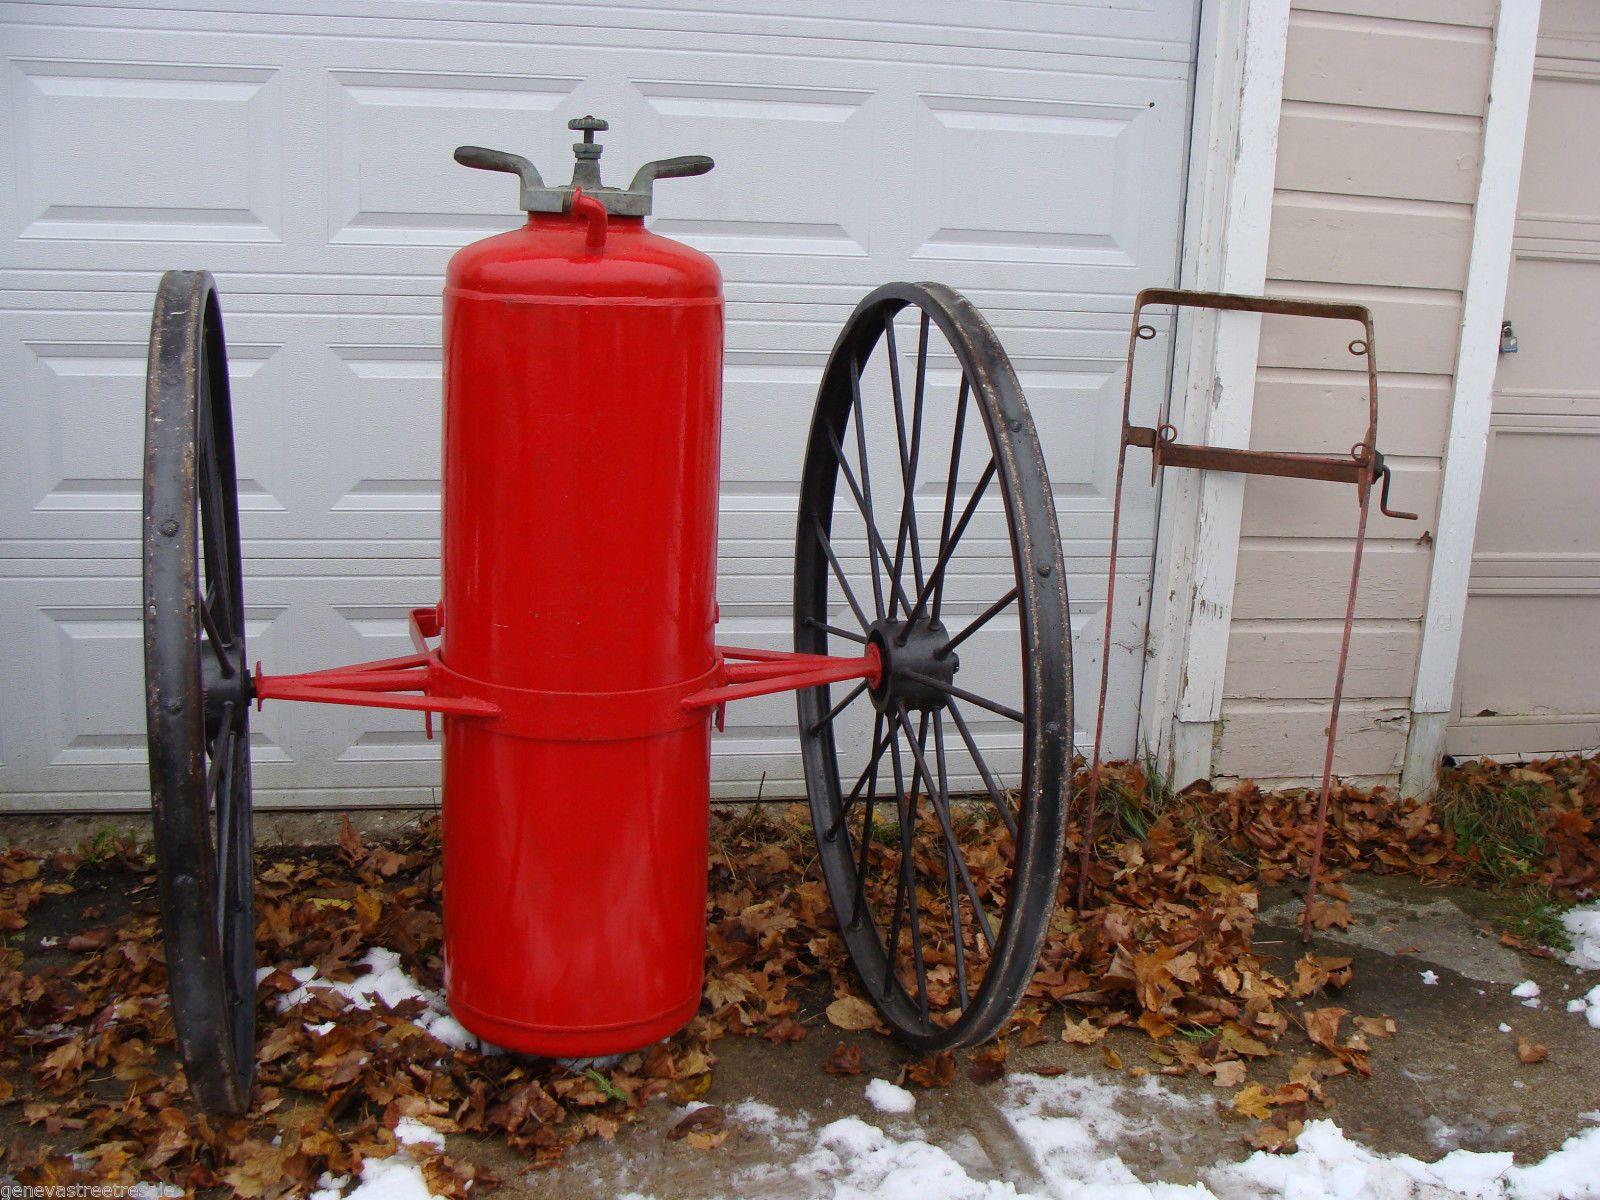 Antique 1800s Ajax Fire Engine Chemical